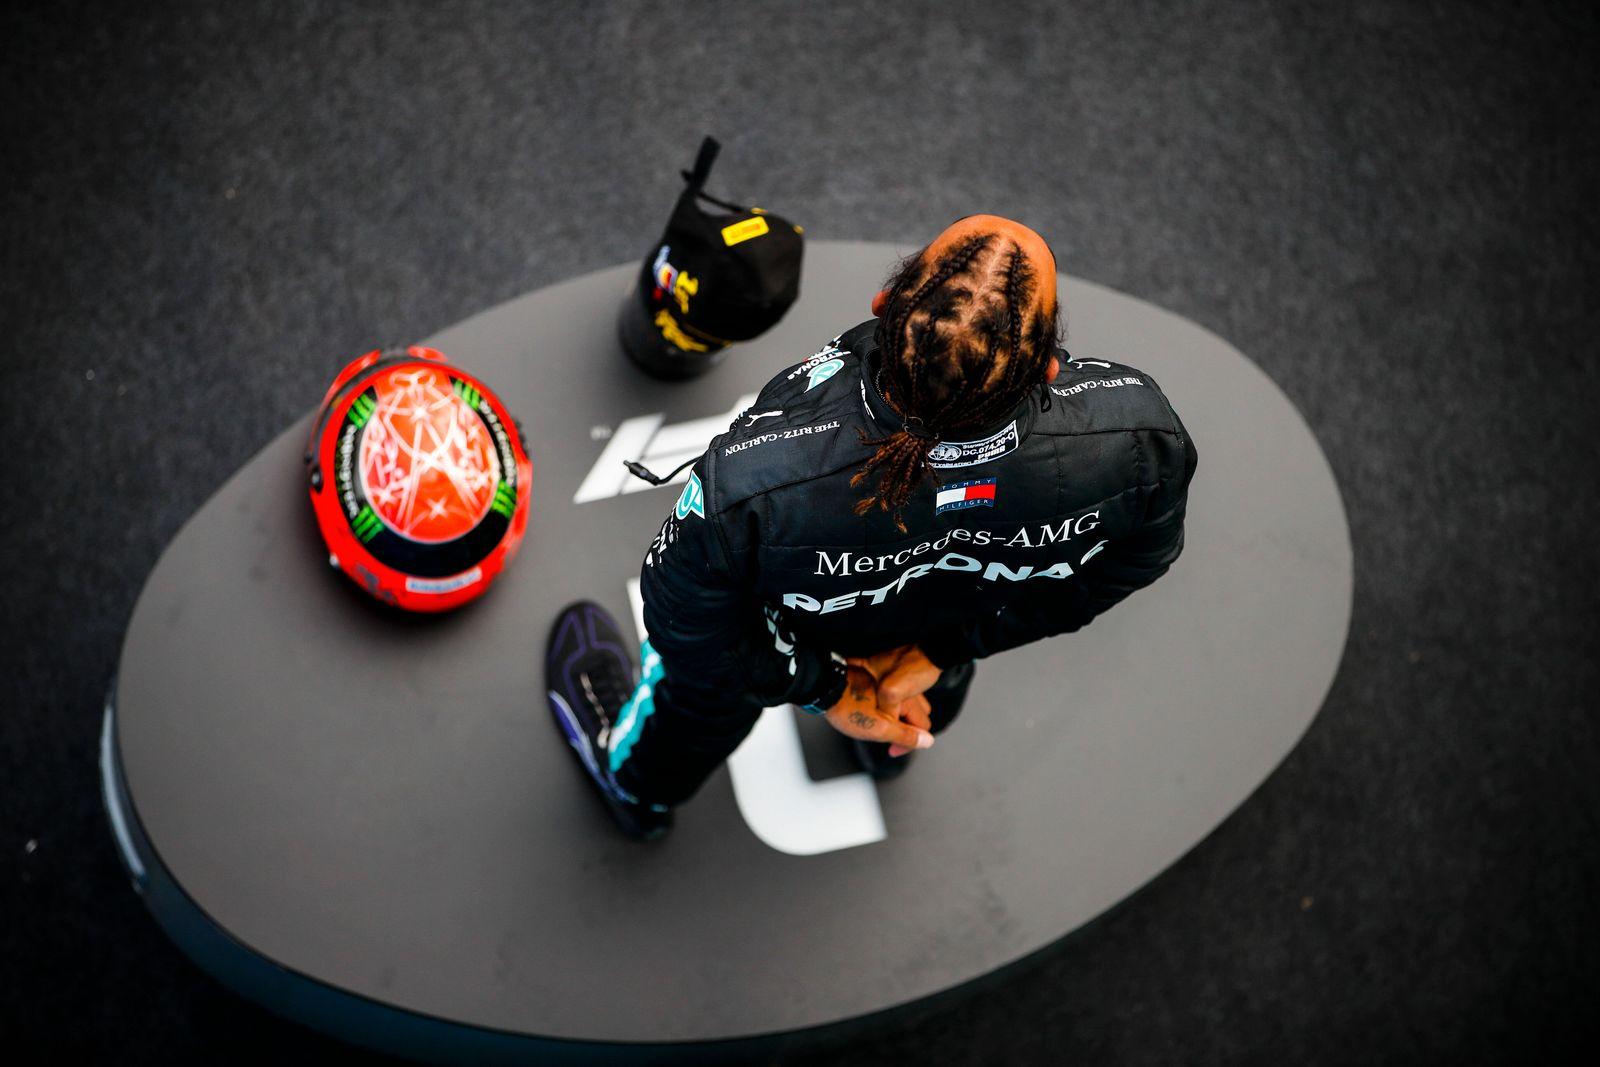 2020 Eifel GP NüRBURGRING, GERMANY - OCTOBER 11: Lewis Hamilton, Mercedes-AMG Petronas F1, 1st position, on the podium